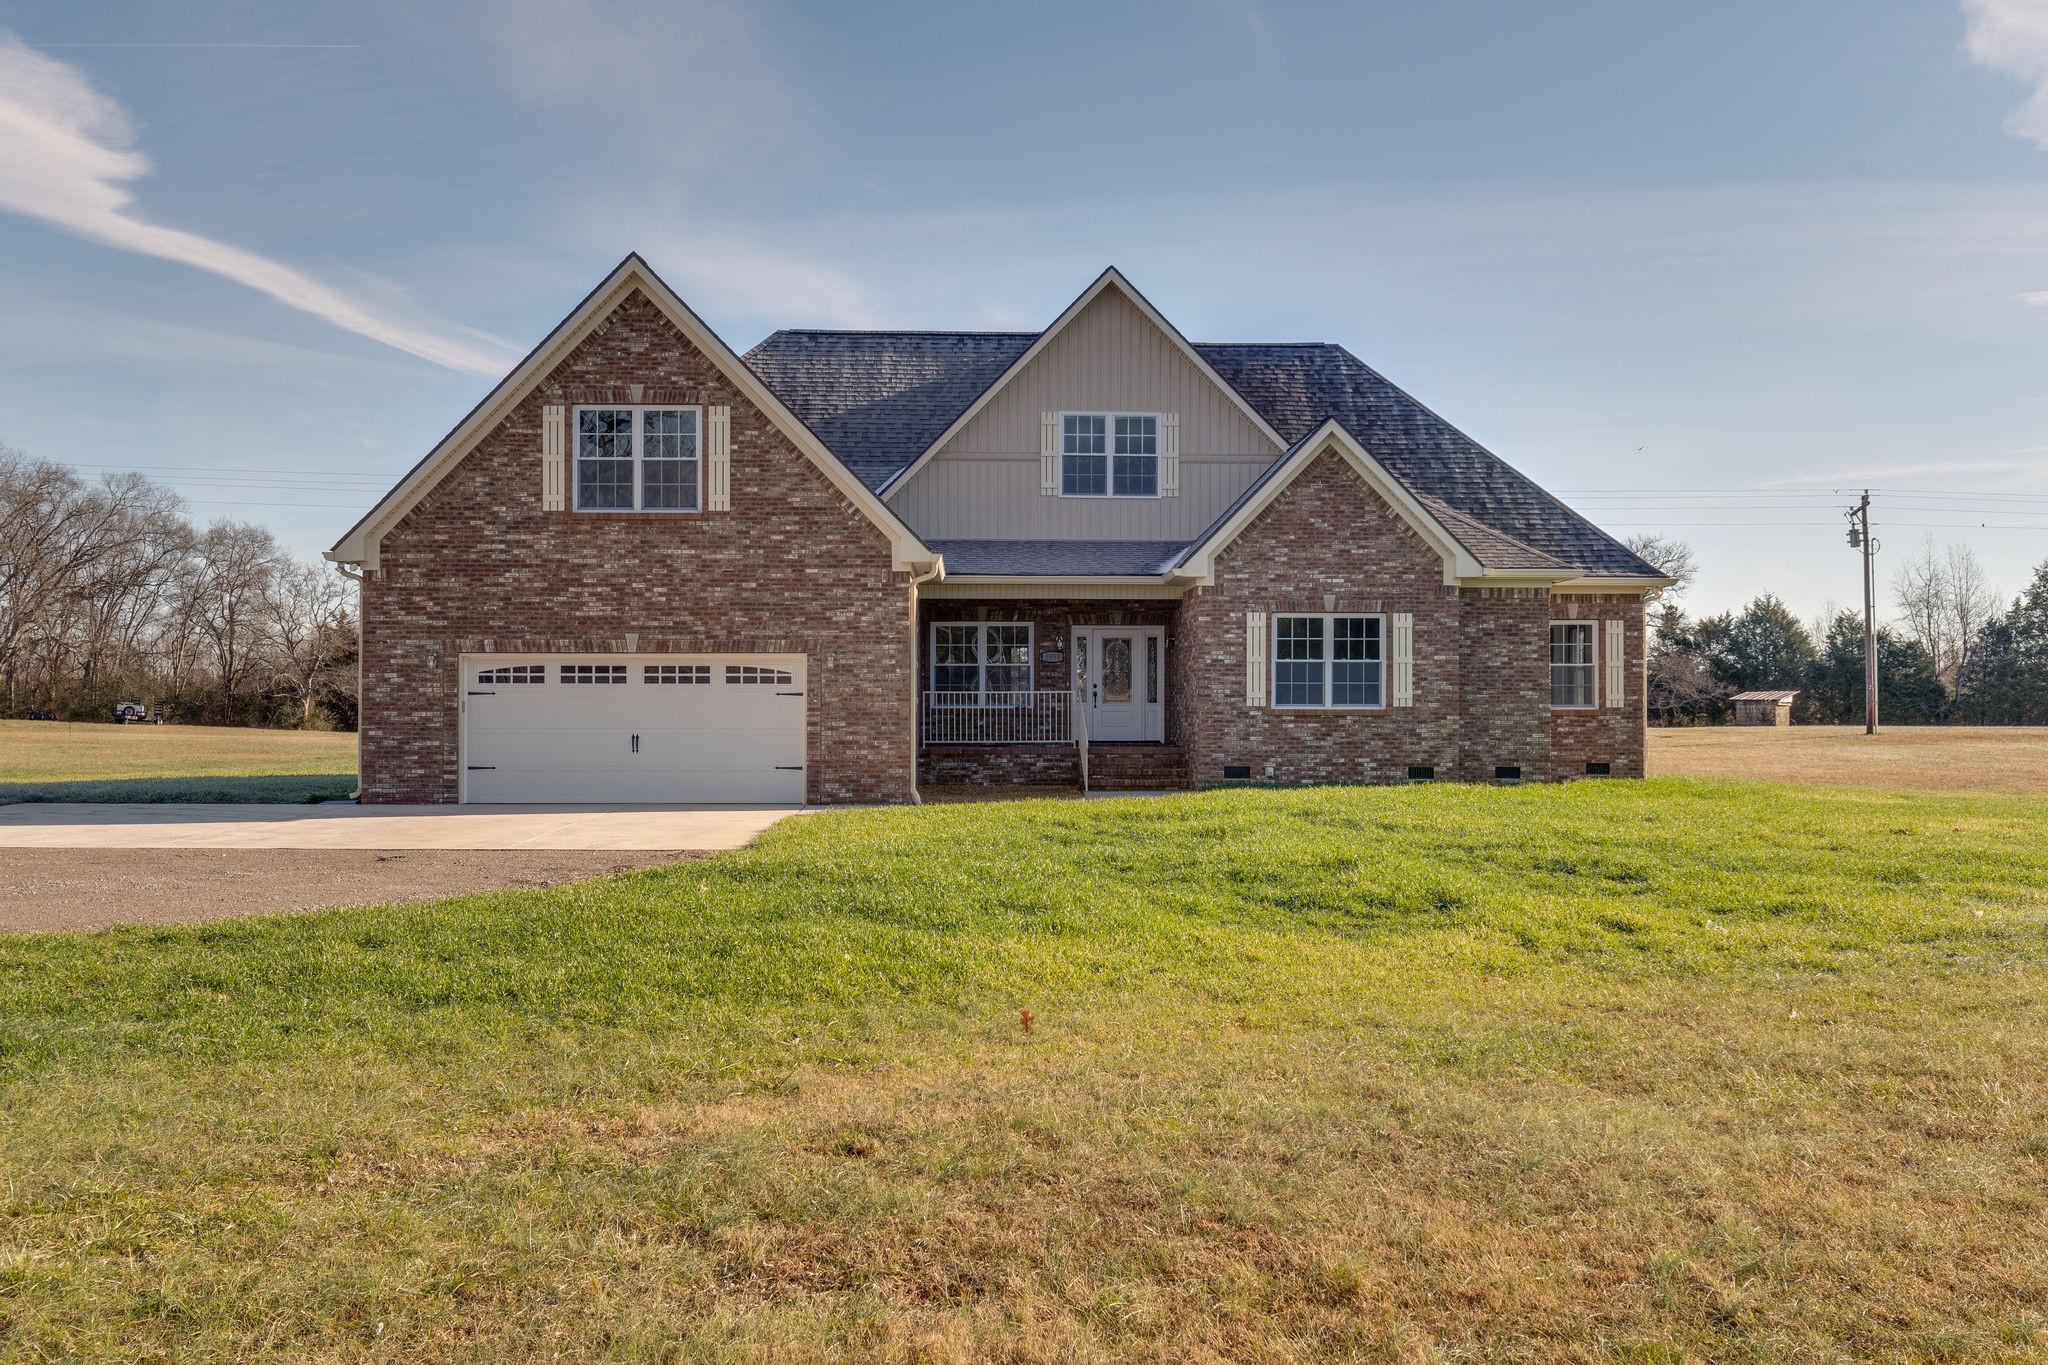 1953 Franklin Pike, Lewisburg, TN 37091 - Lewisburg, TN real estate listing